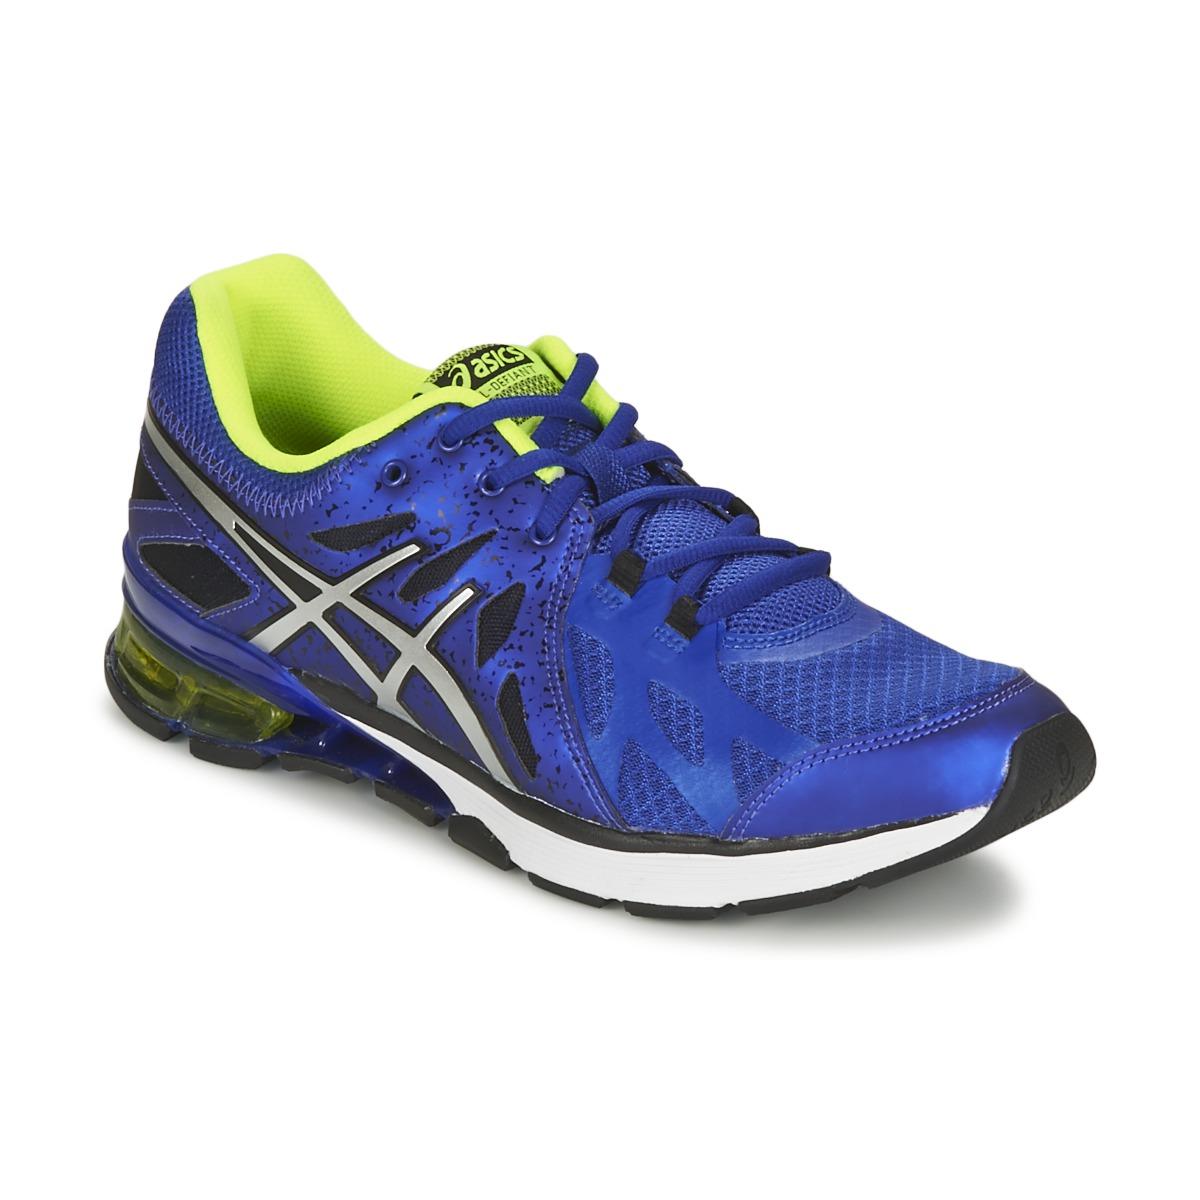 Fitness shoes Asics GEL-DEFIANT Blue